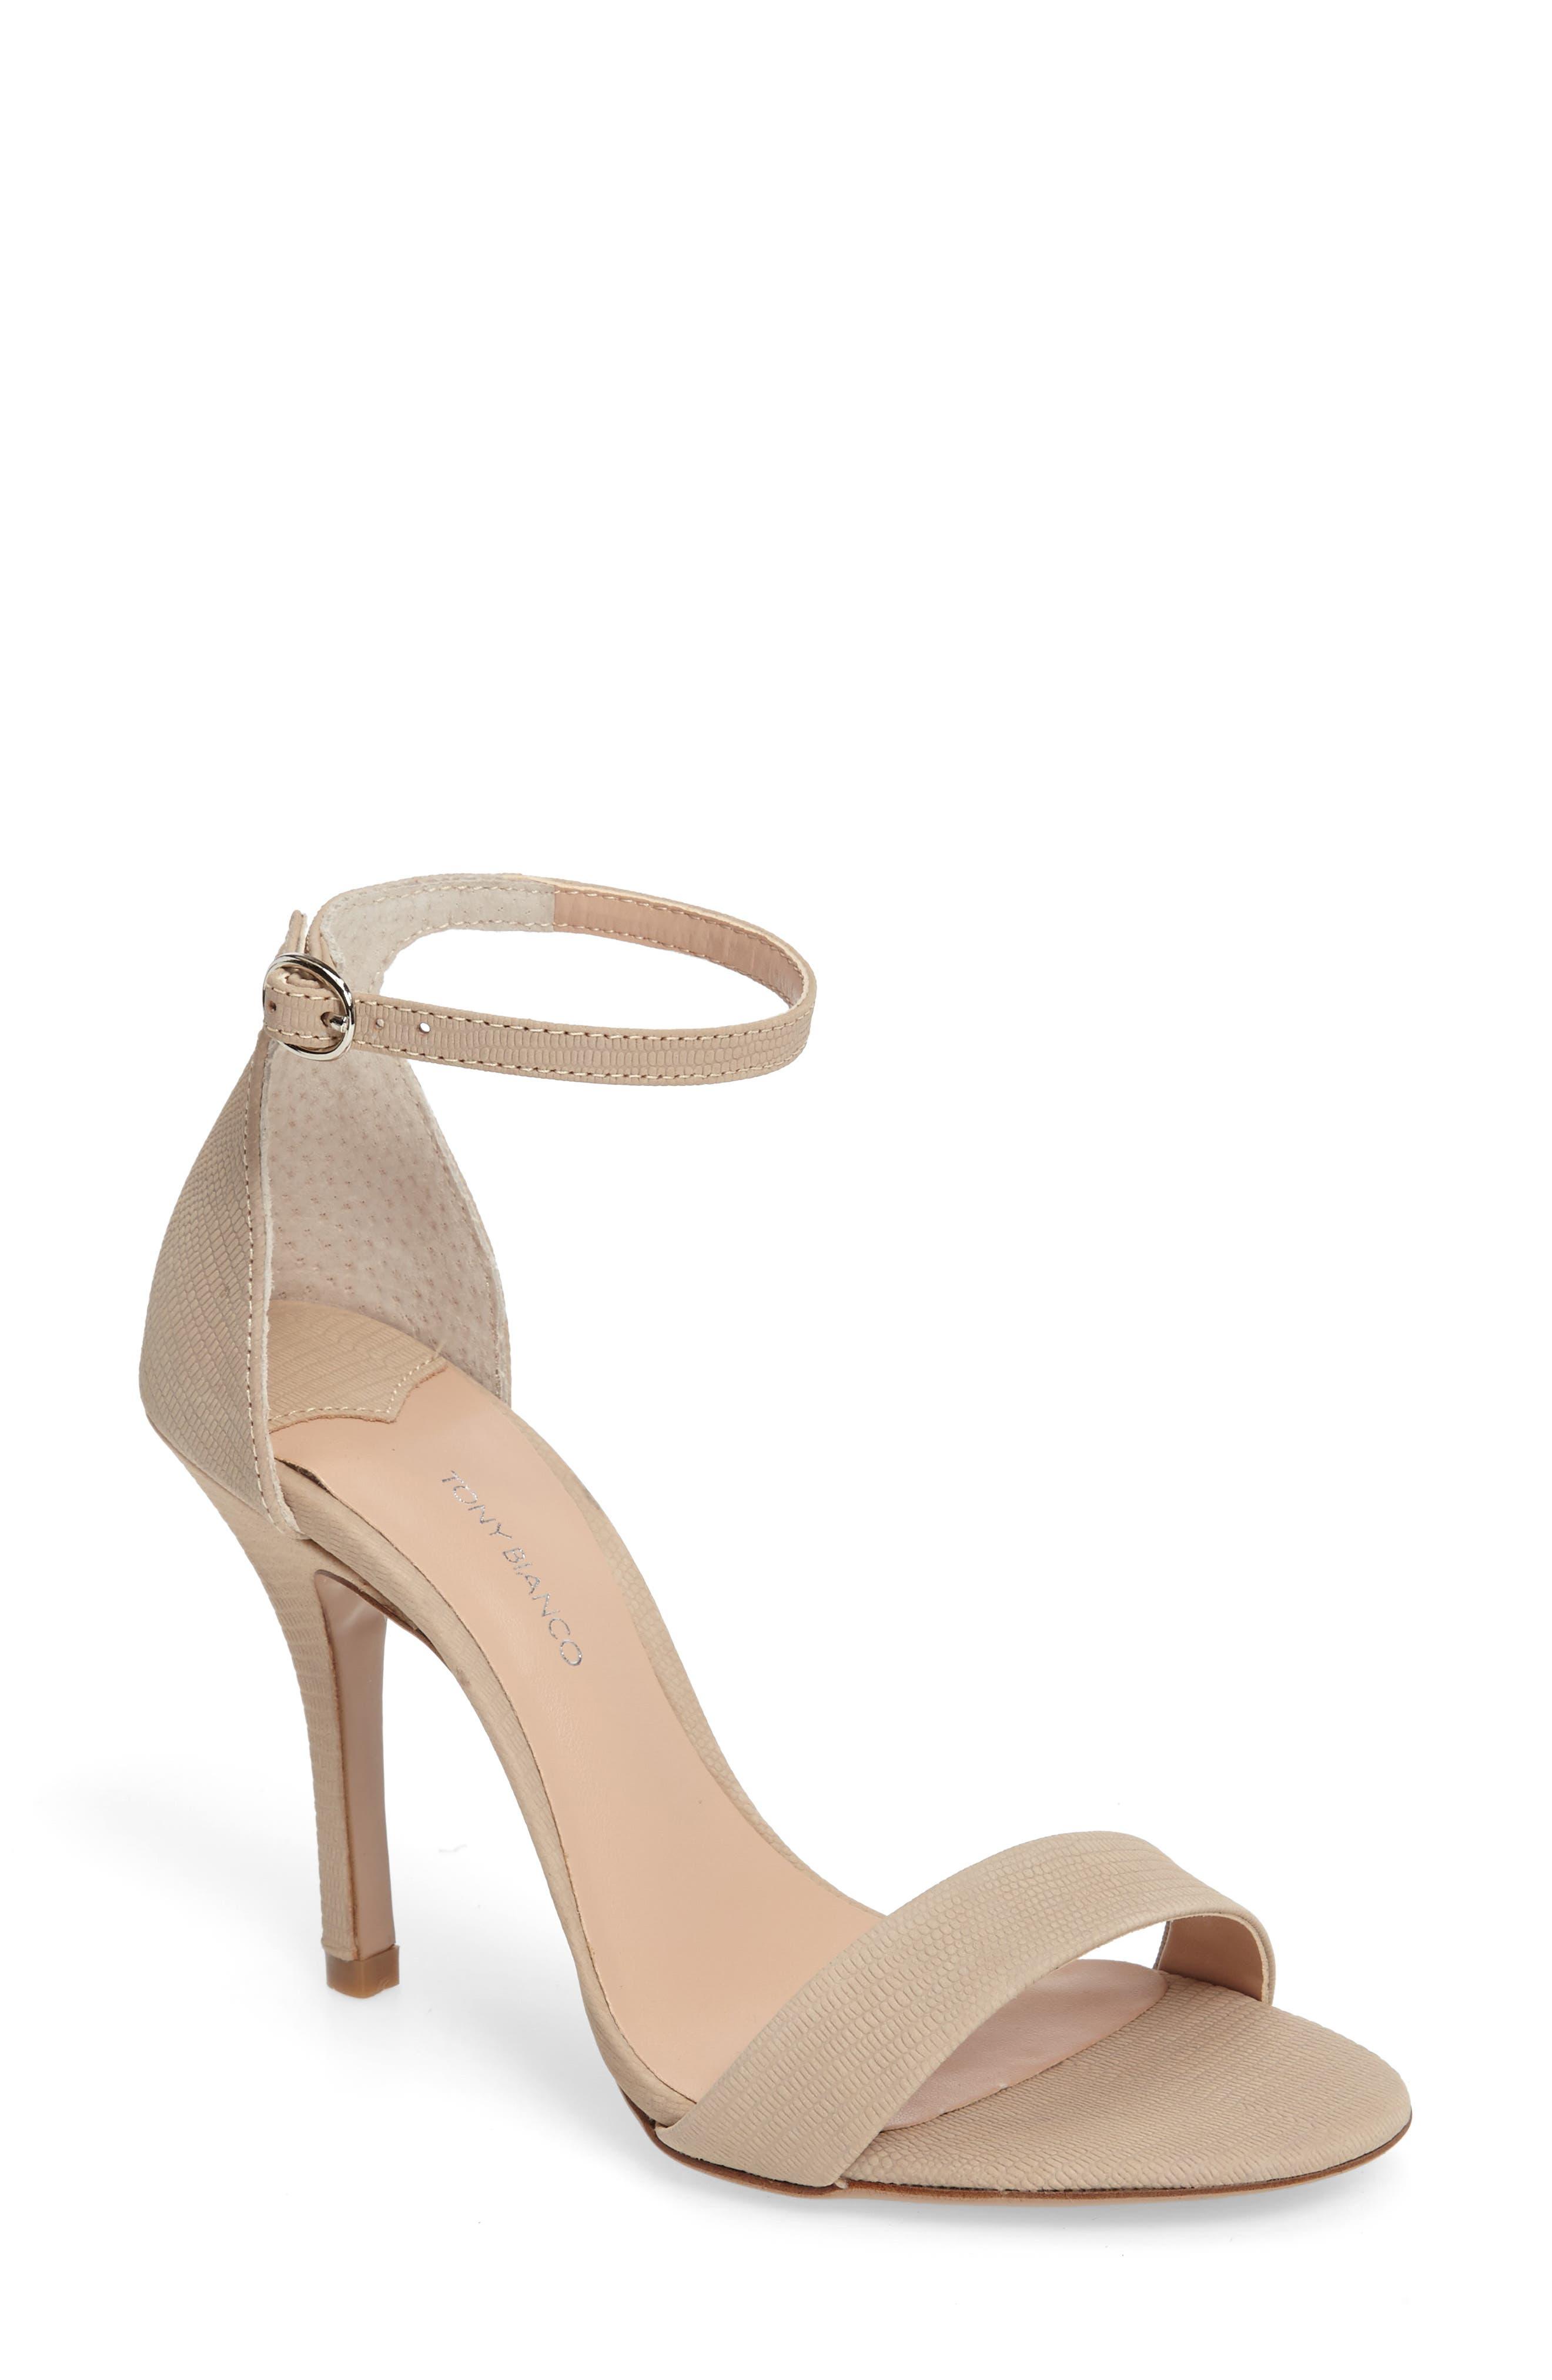 Image of Tony Bianco Lovinia Strappy Sandal